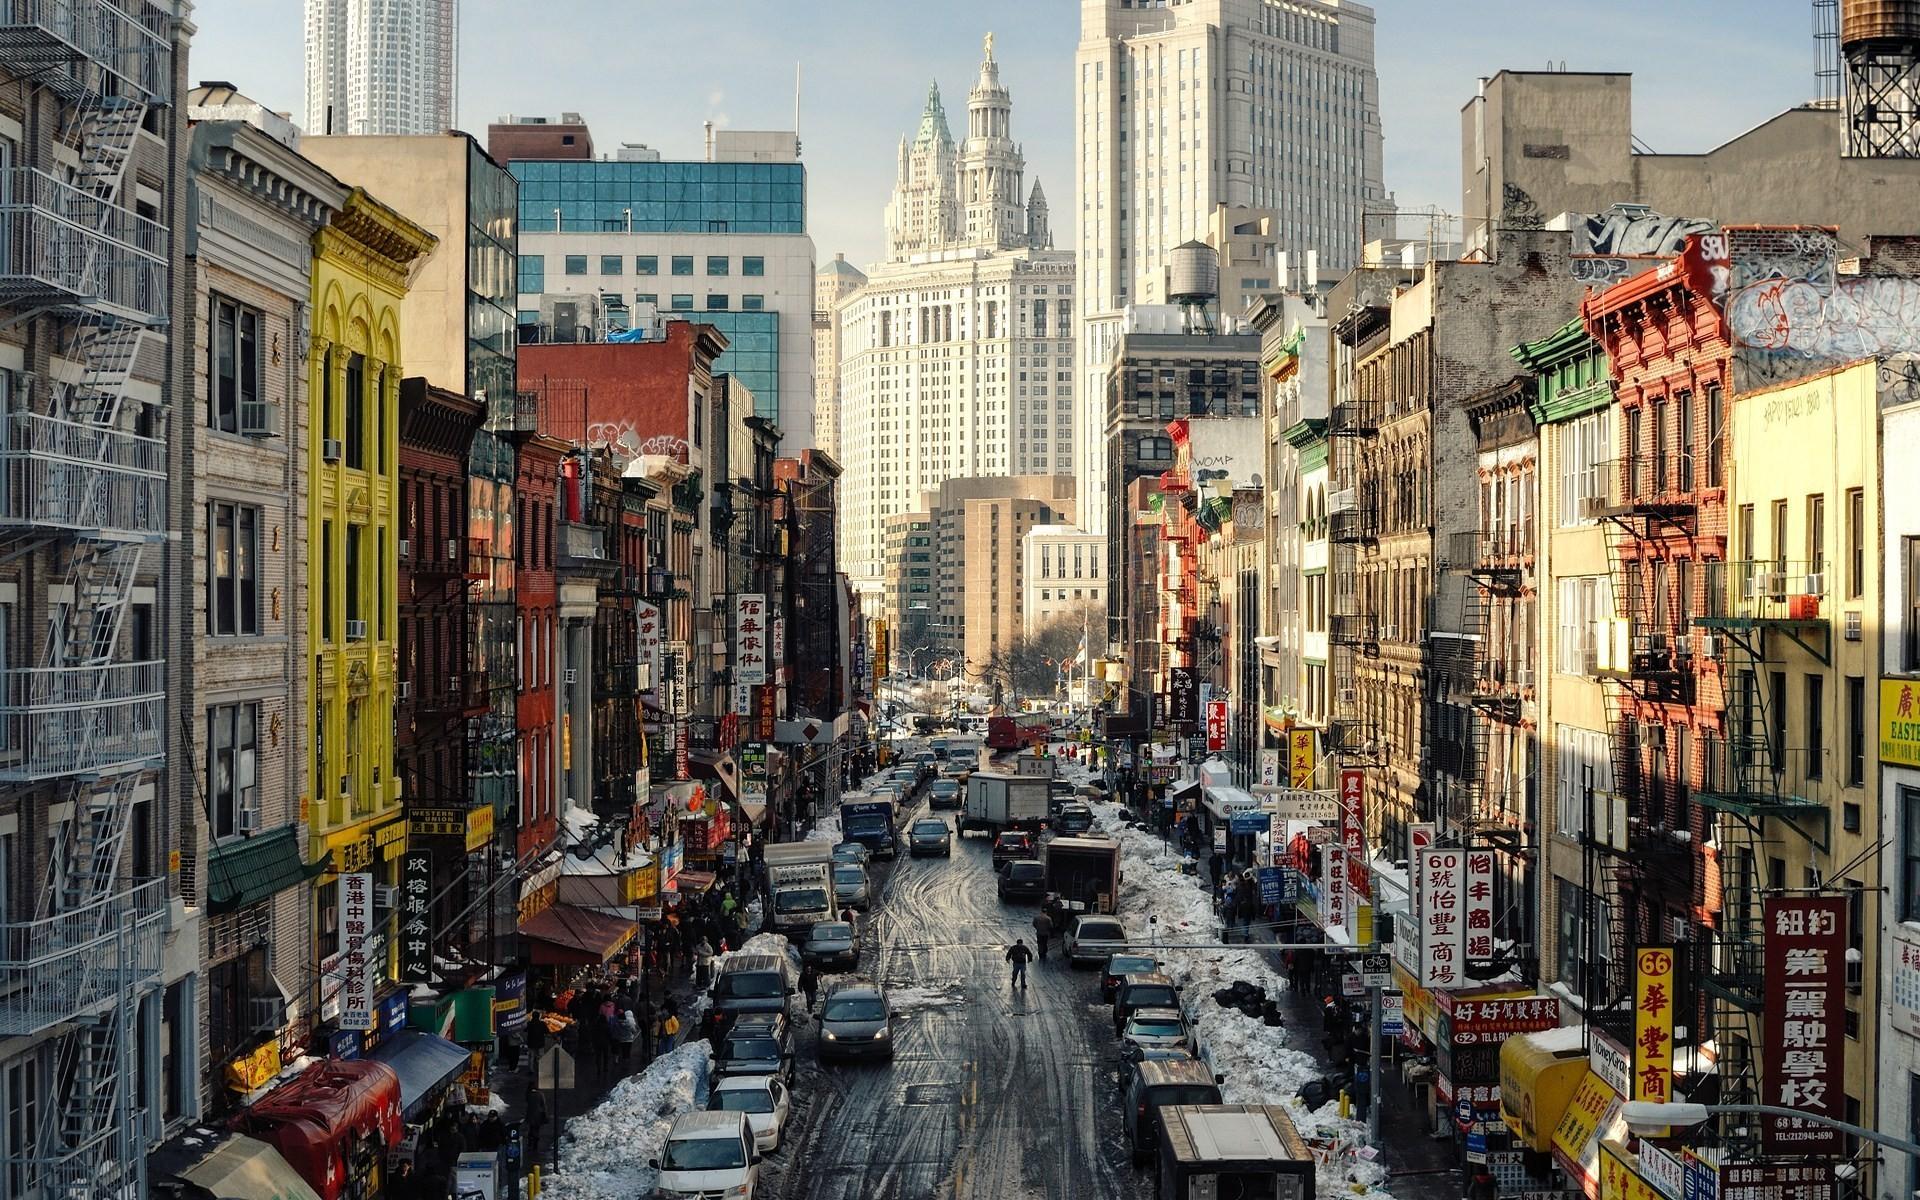 Free Download Fond Ecran New York City Chinatown Winter Wallpaper Hd Telecharger 1920x1200 For Your Desktop Mobile Tablet Explore 48 New York City Winter Wallpaper New York City Winter